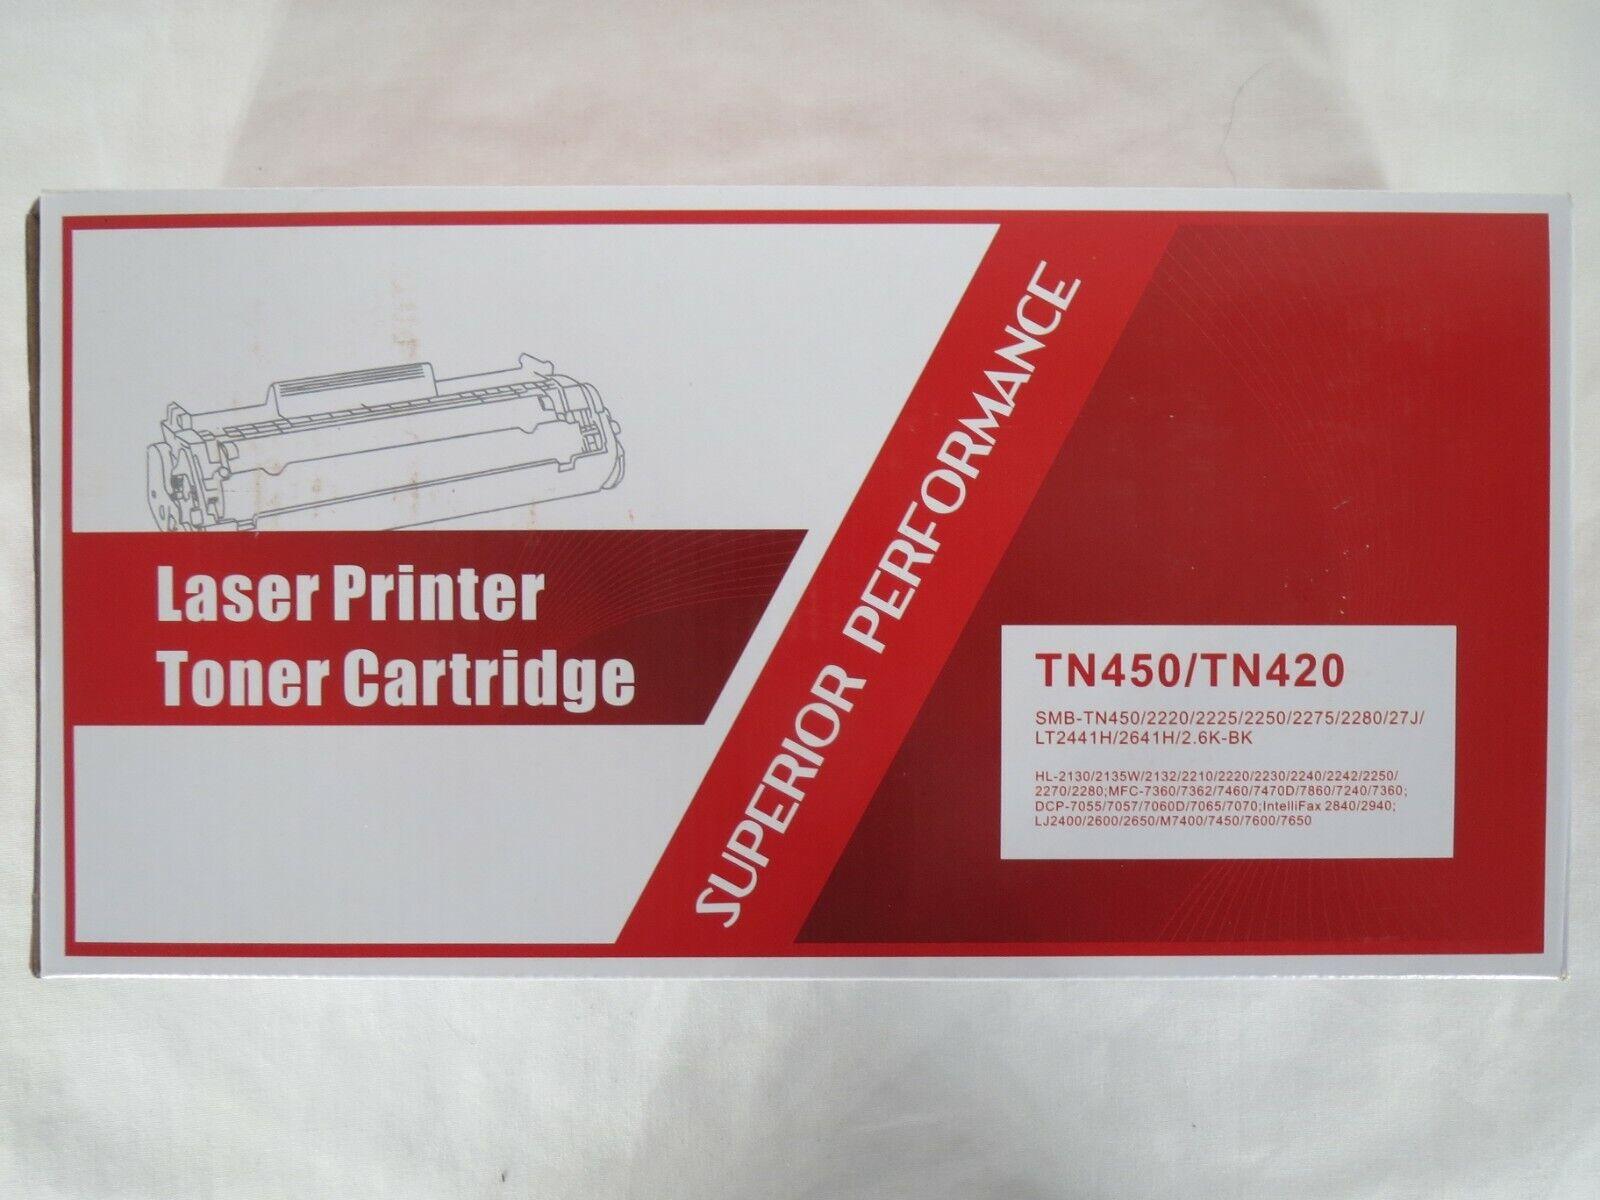 laser printer premium toner cartridge smb tn450